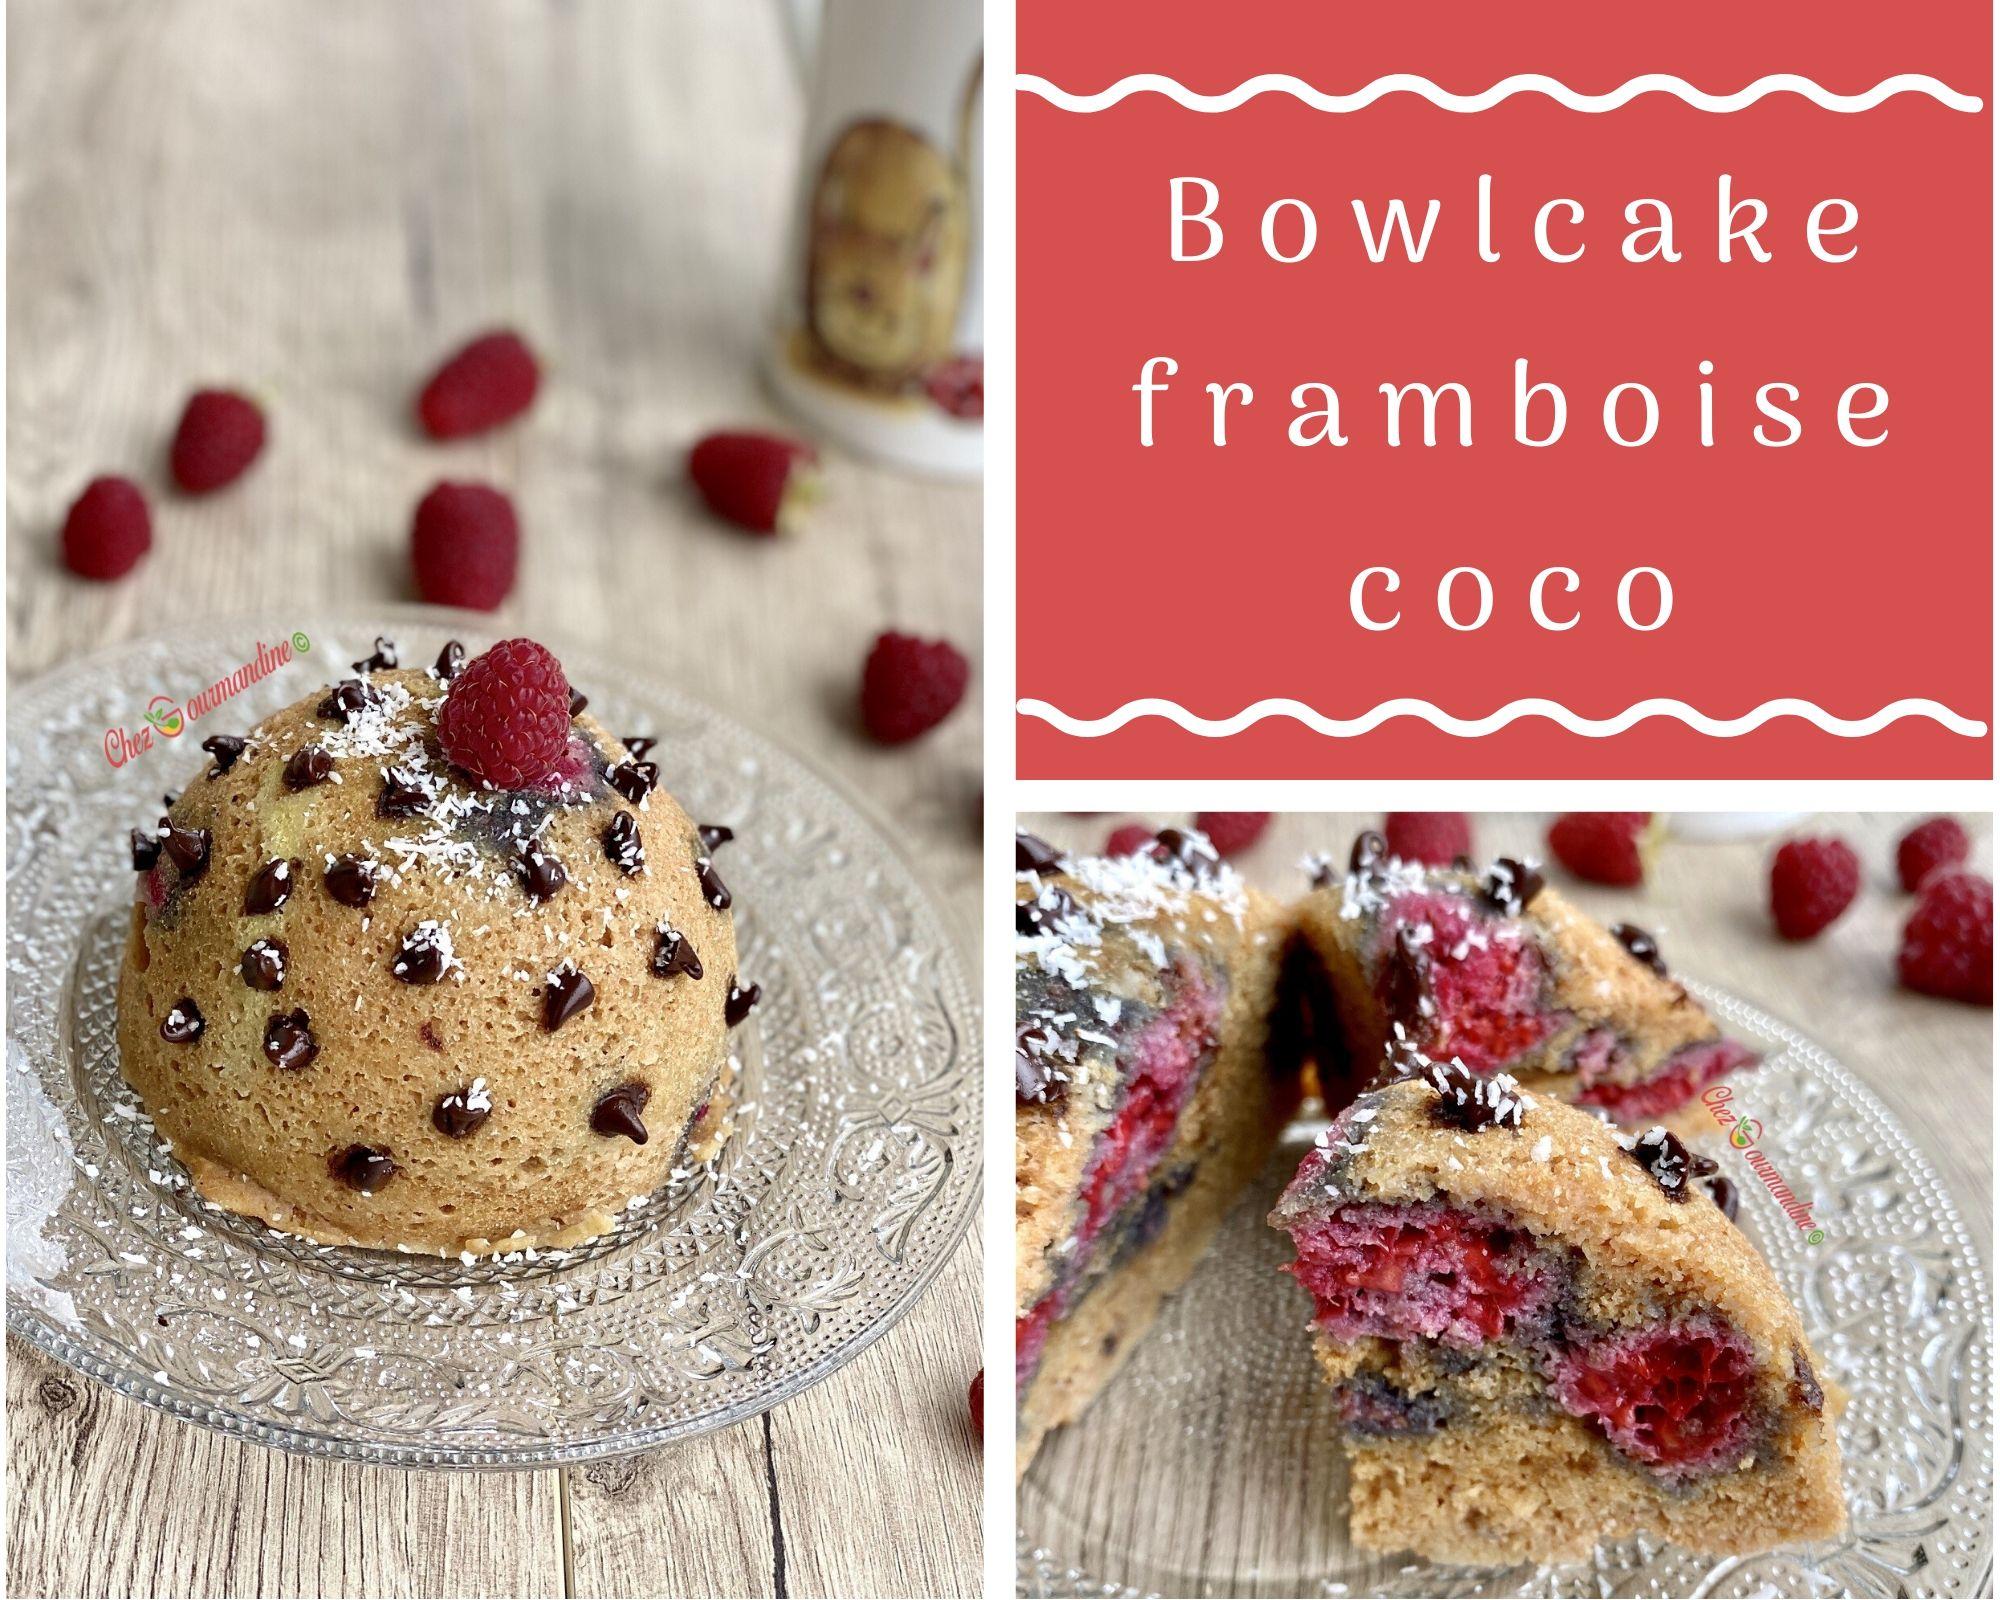 Bowlcake framboise coco